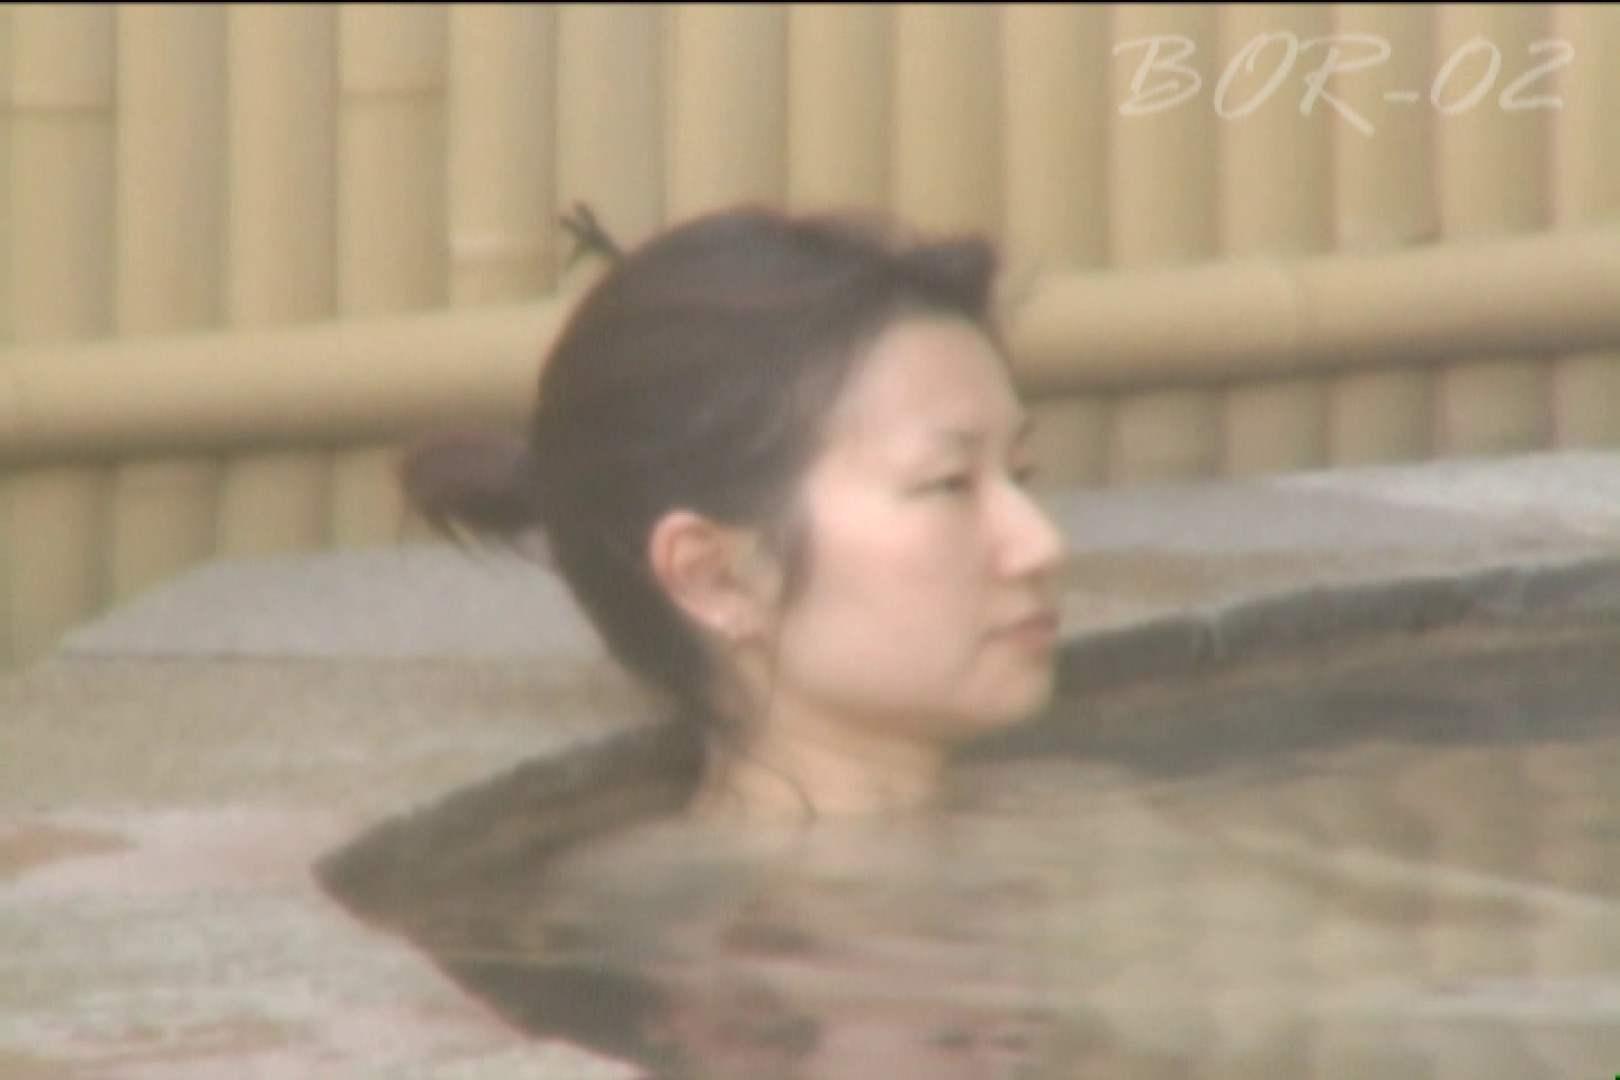 Aquaな露天風呂Vol.477 露天 アダルト動画キャプチャ 99PICs 65